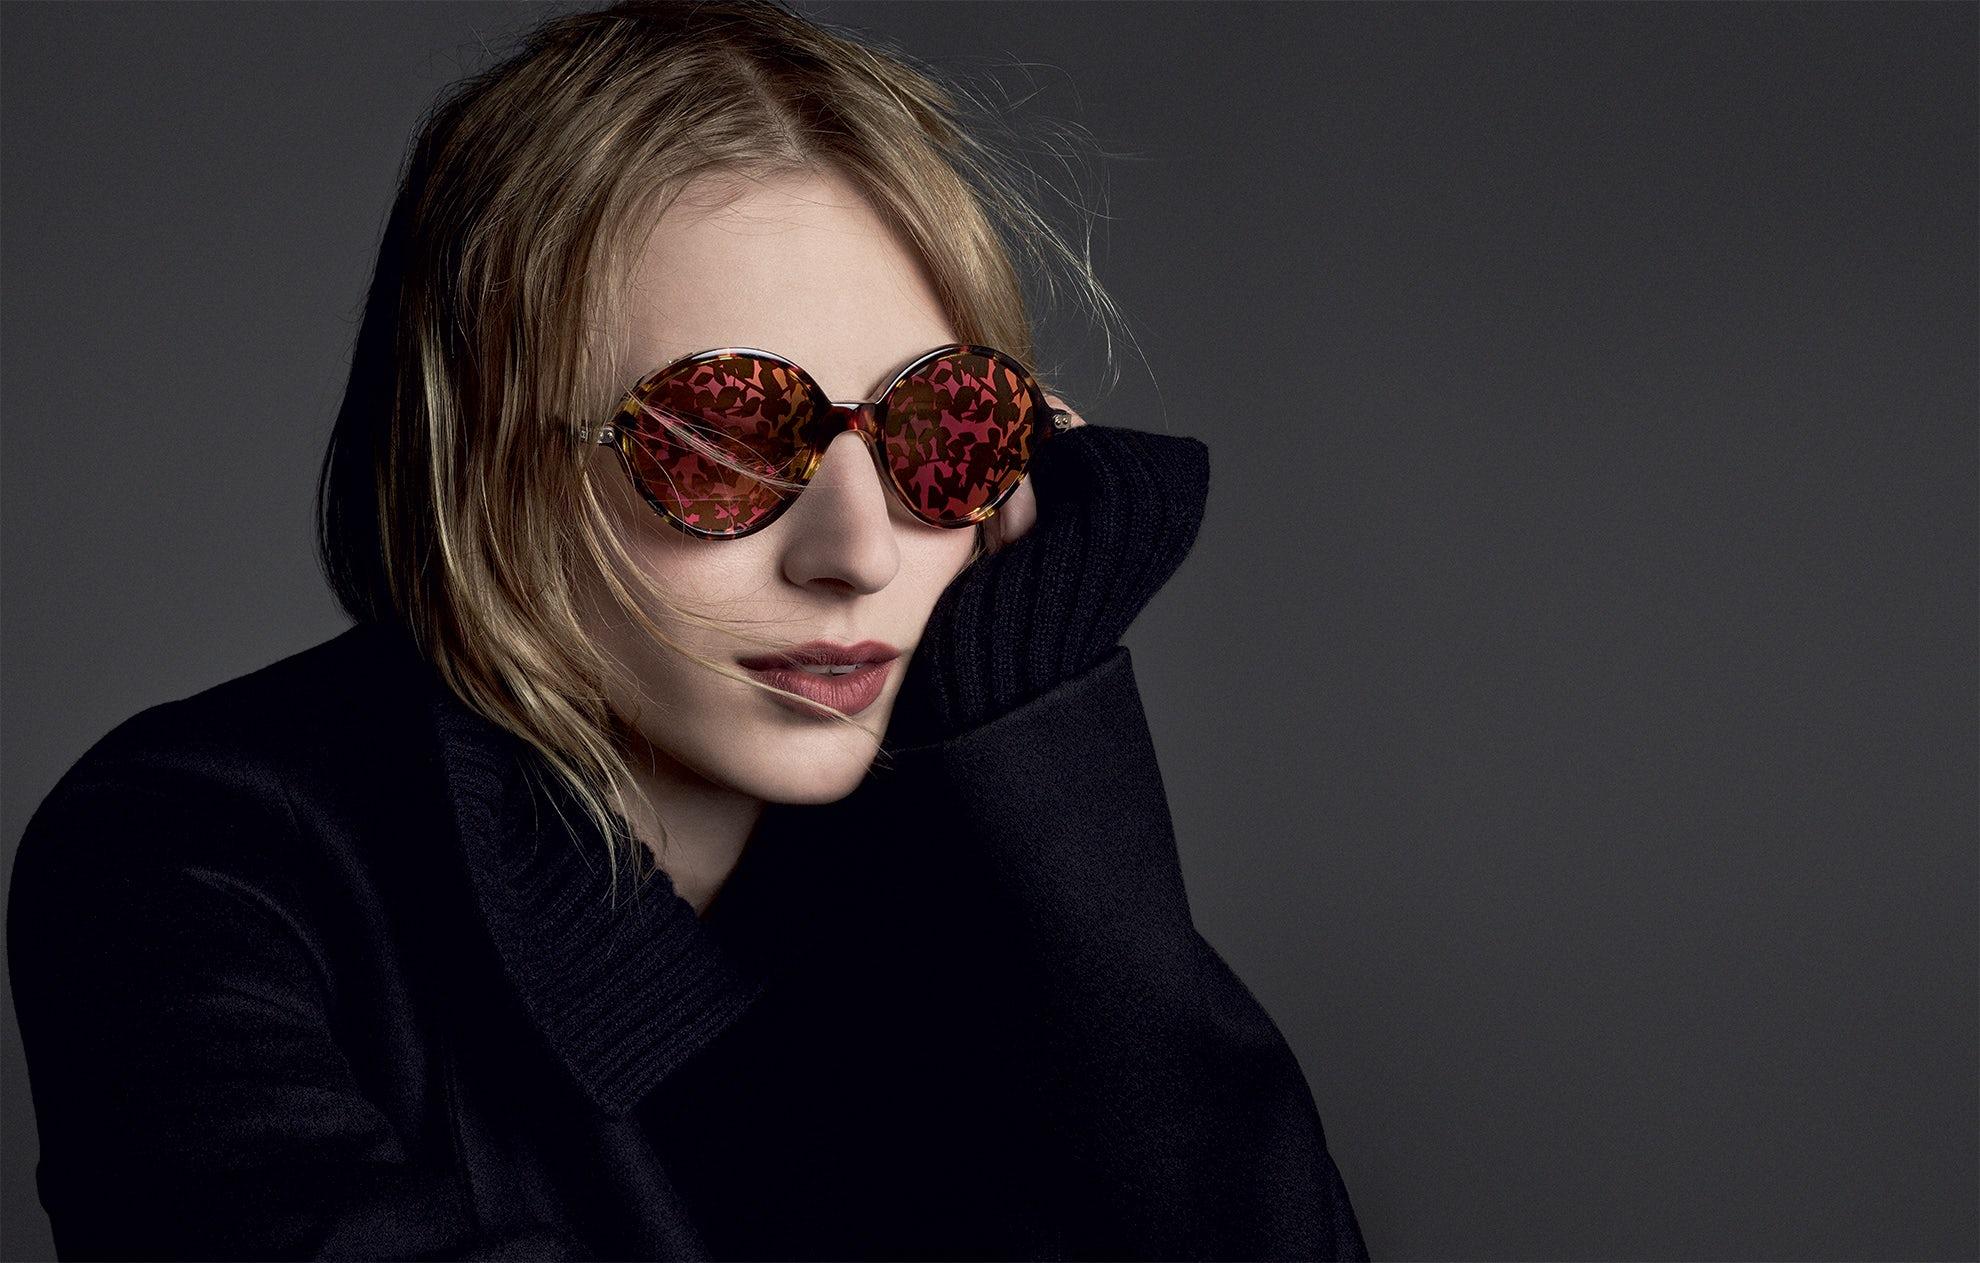 Dior Eyeglass Frames 2016 : Behind Diors Sunglasses Success Intelligence BoF